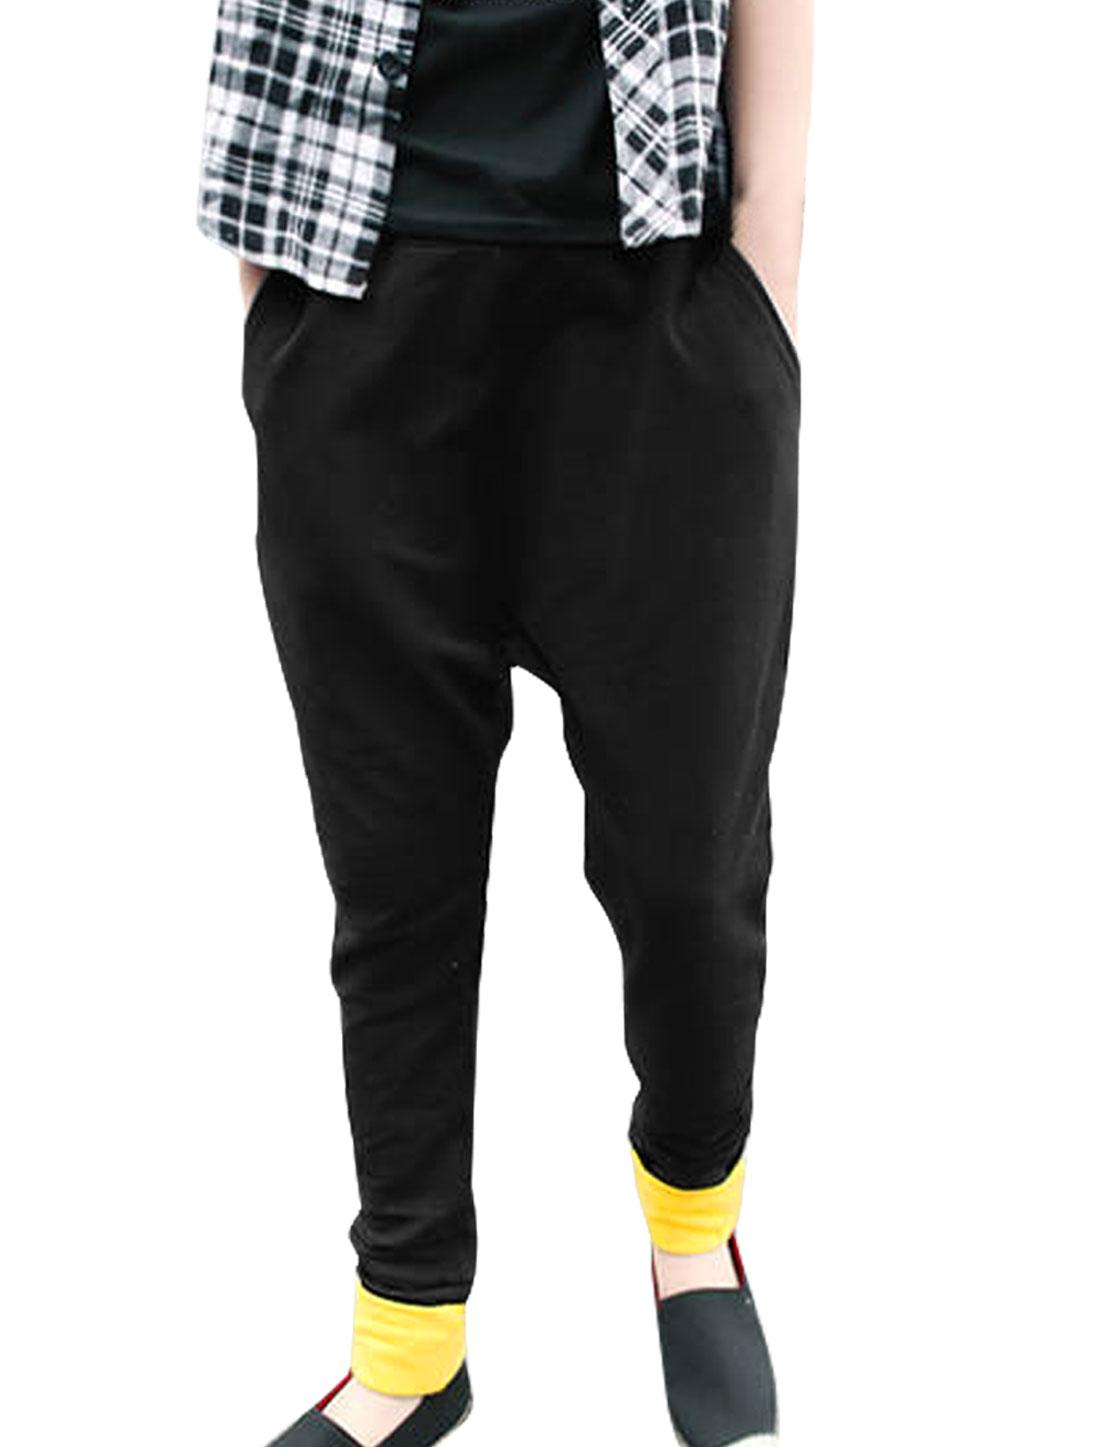 Mens Black Elastic Waist Slant Side Pockets Casual Stylish Trouser W28